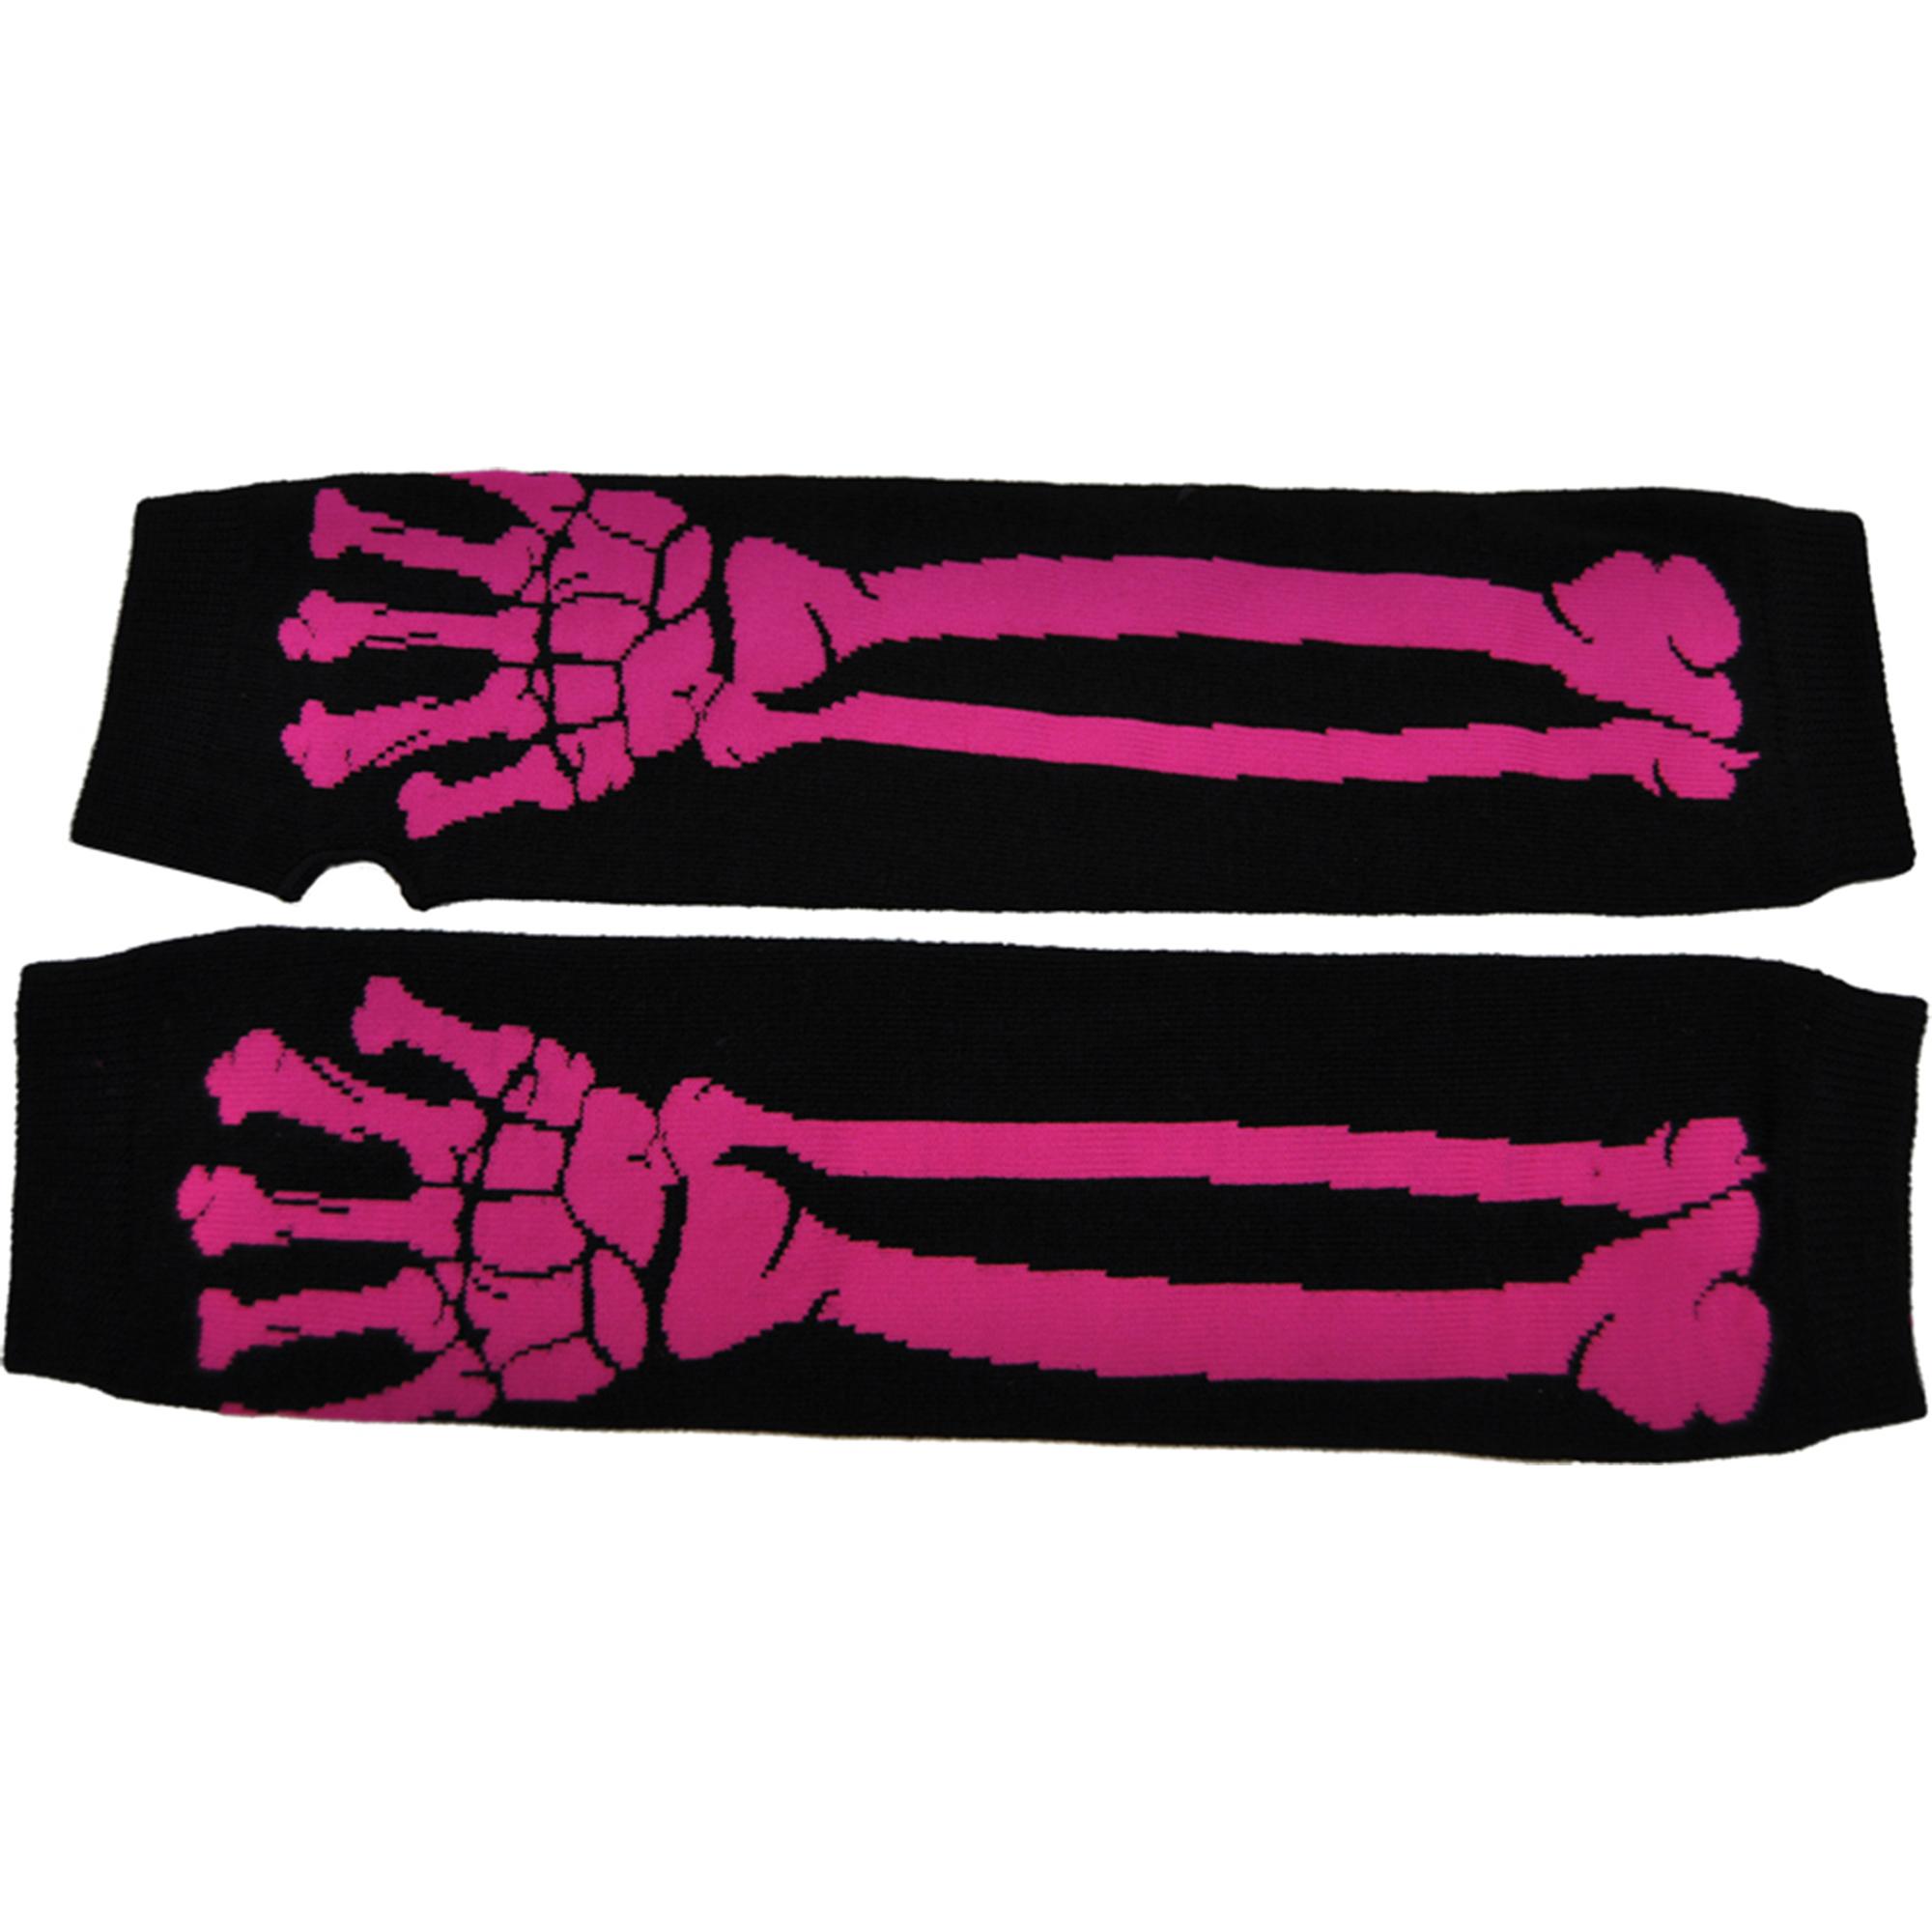 Morris Costumes Glove Long Pink Bone Print, Style, SA10428